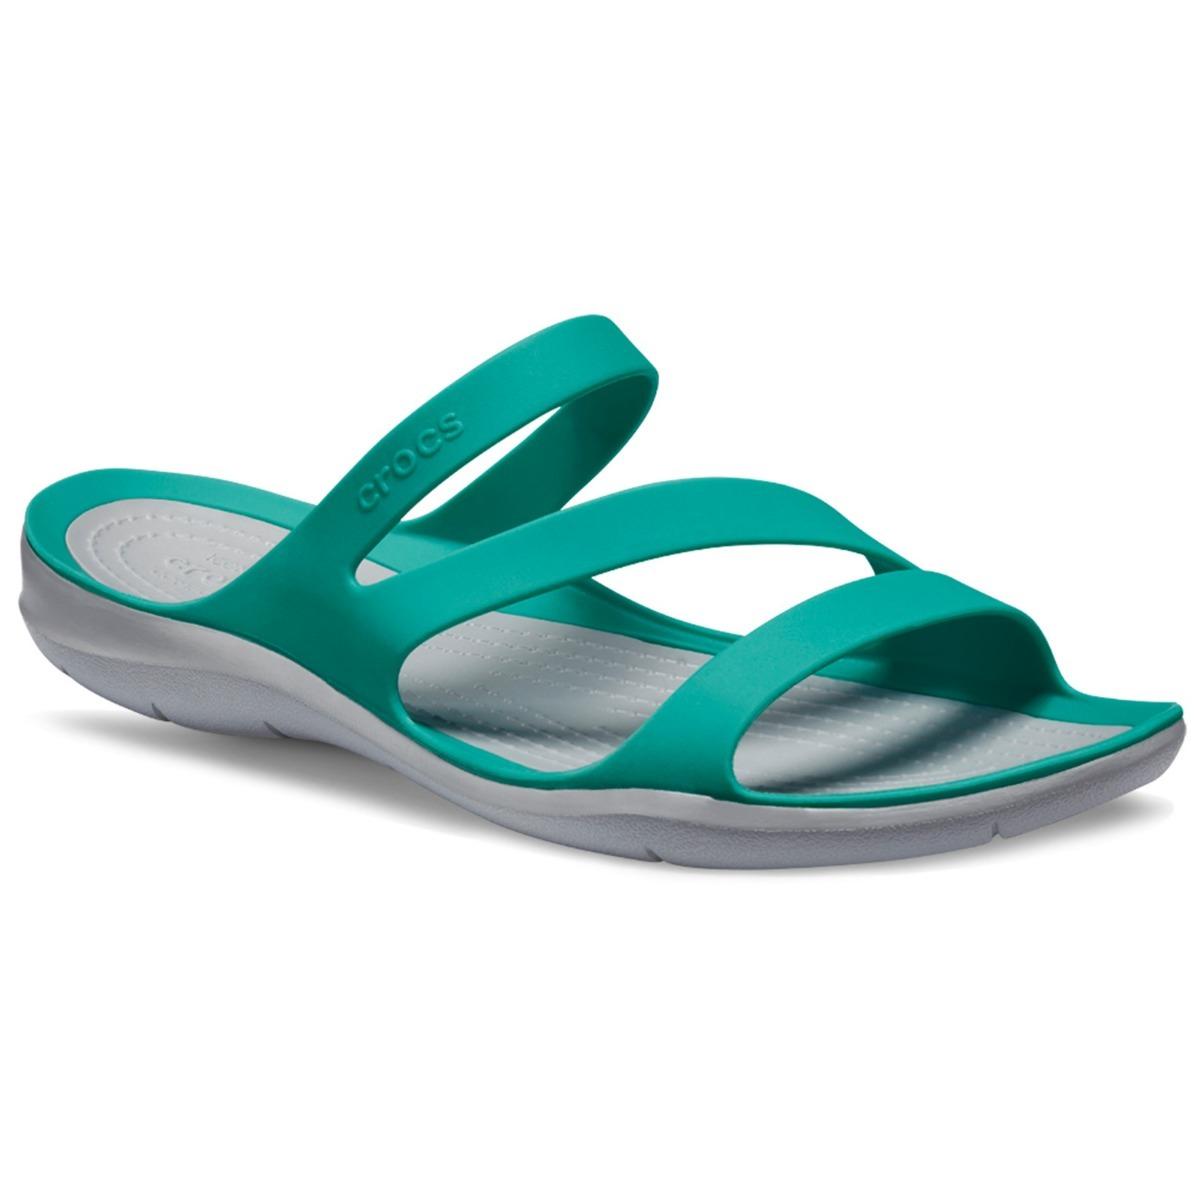 00 Swifwater Gris1 Mujer Sandal Crocs W 085 Verde Con Sandalia dxBreWCo